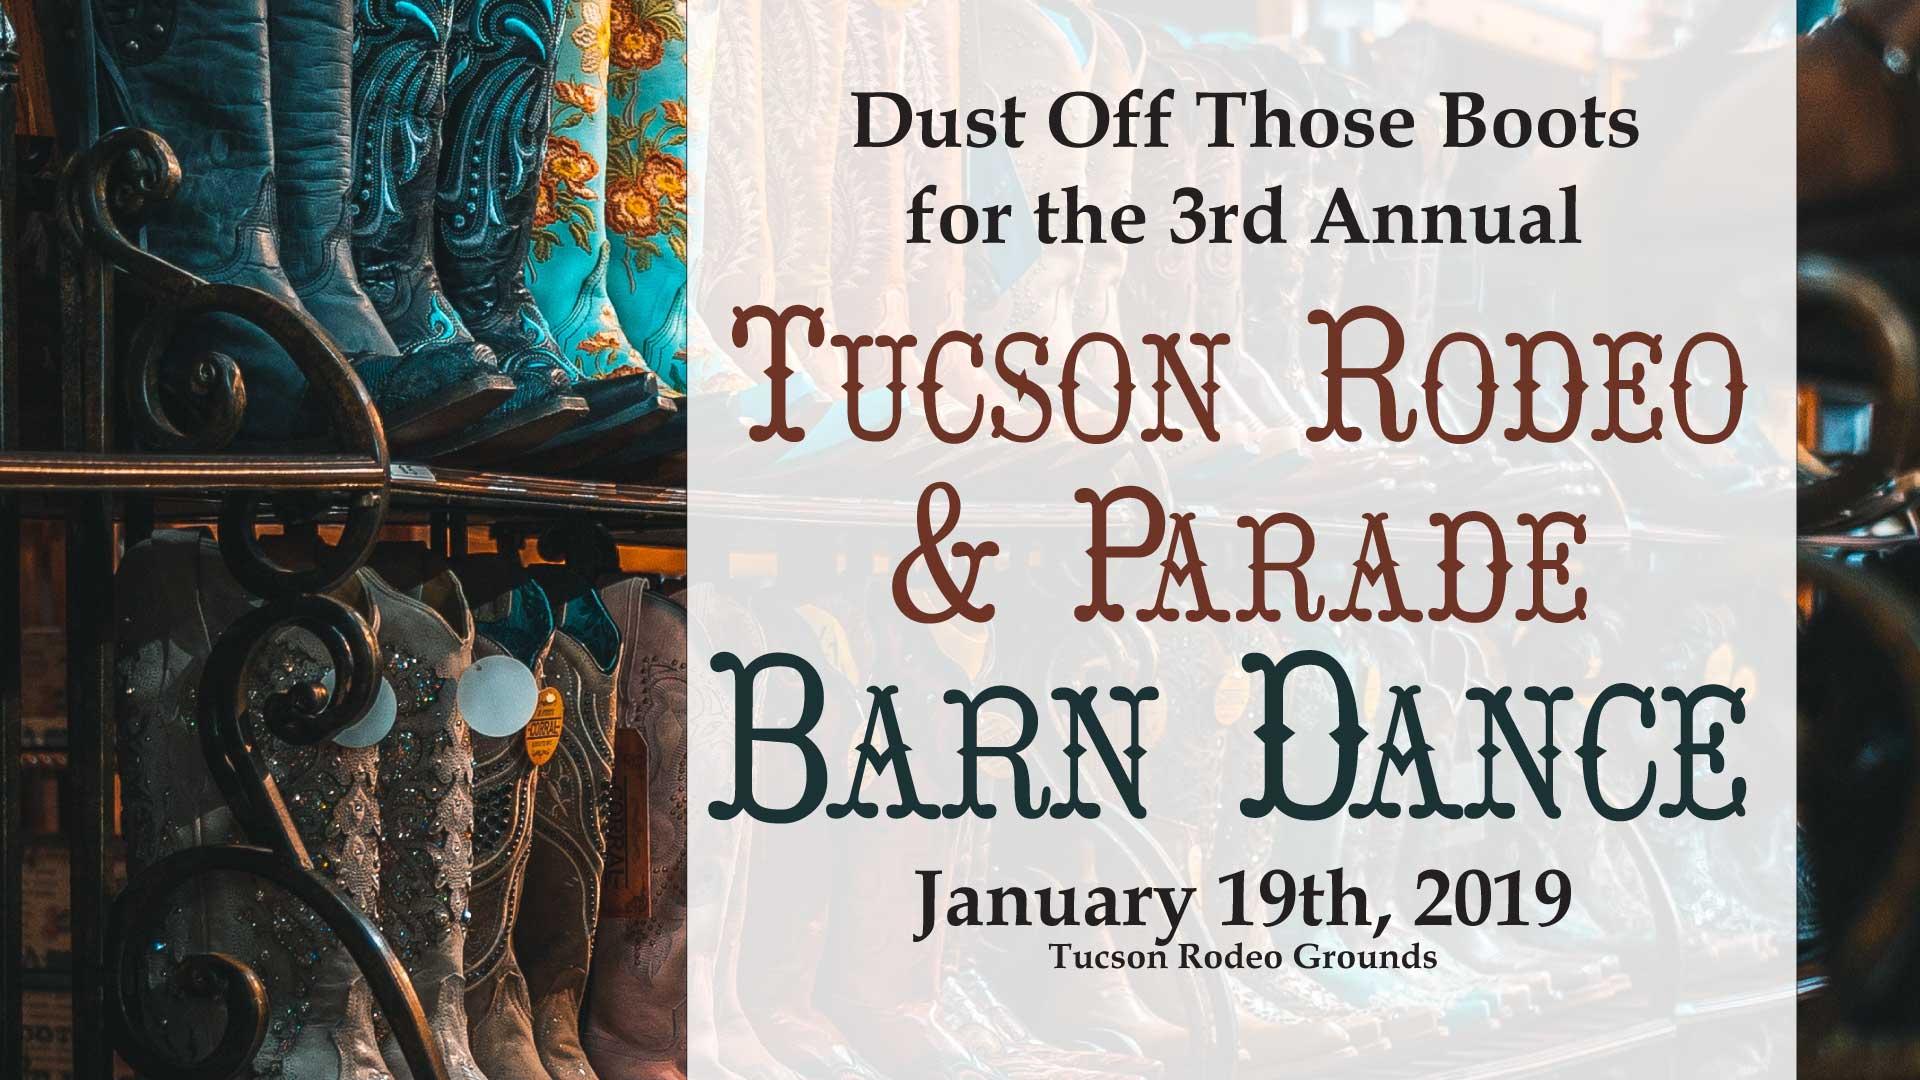 Barn Dance Tucson Rodeo Parade